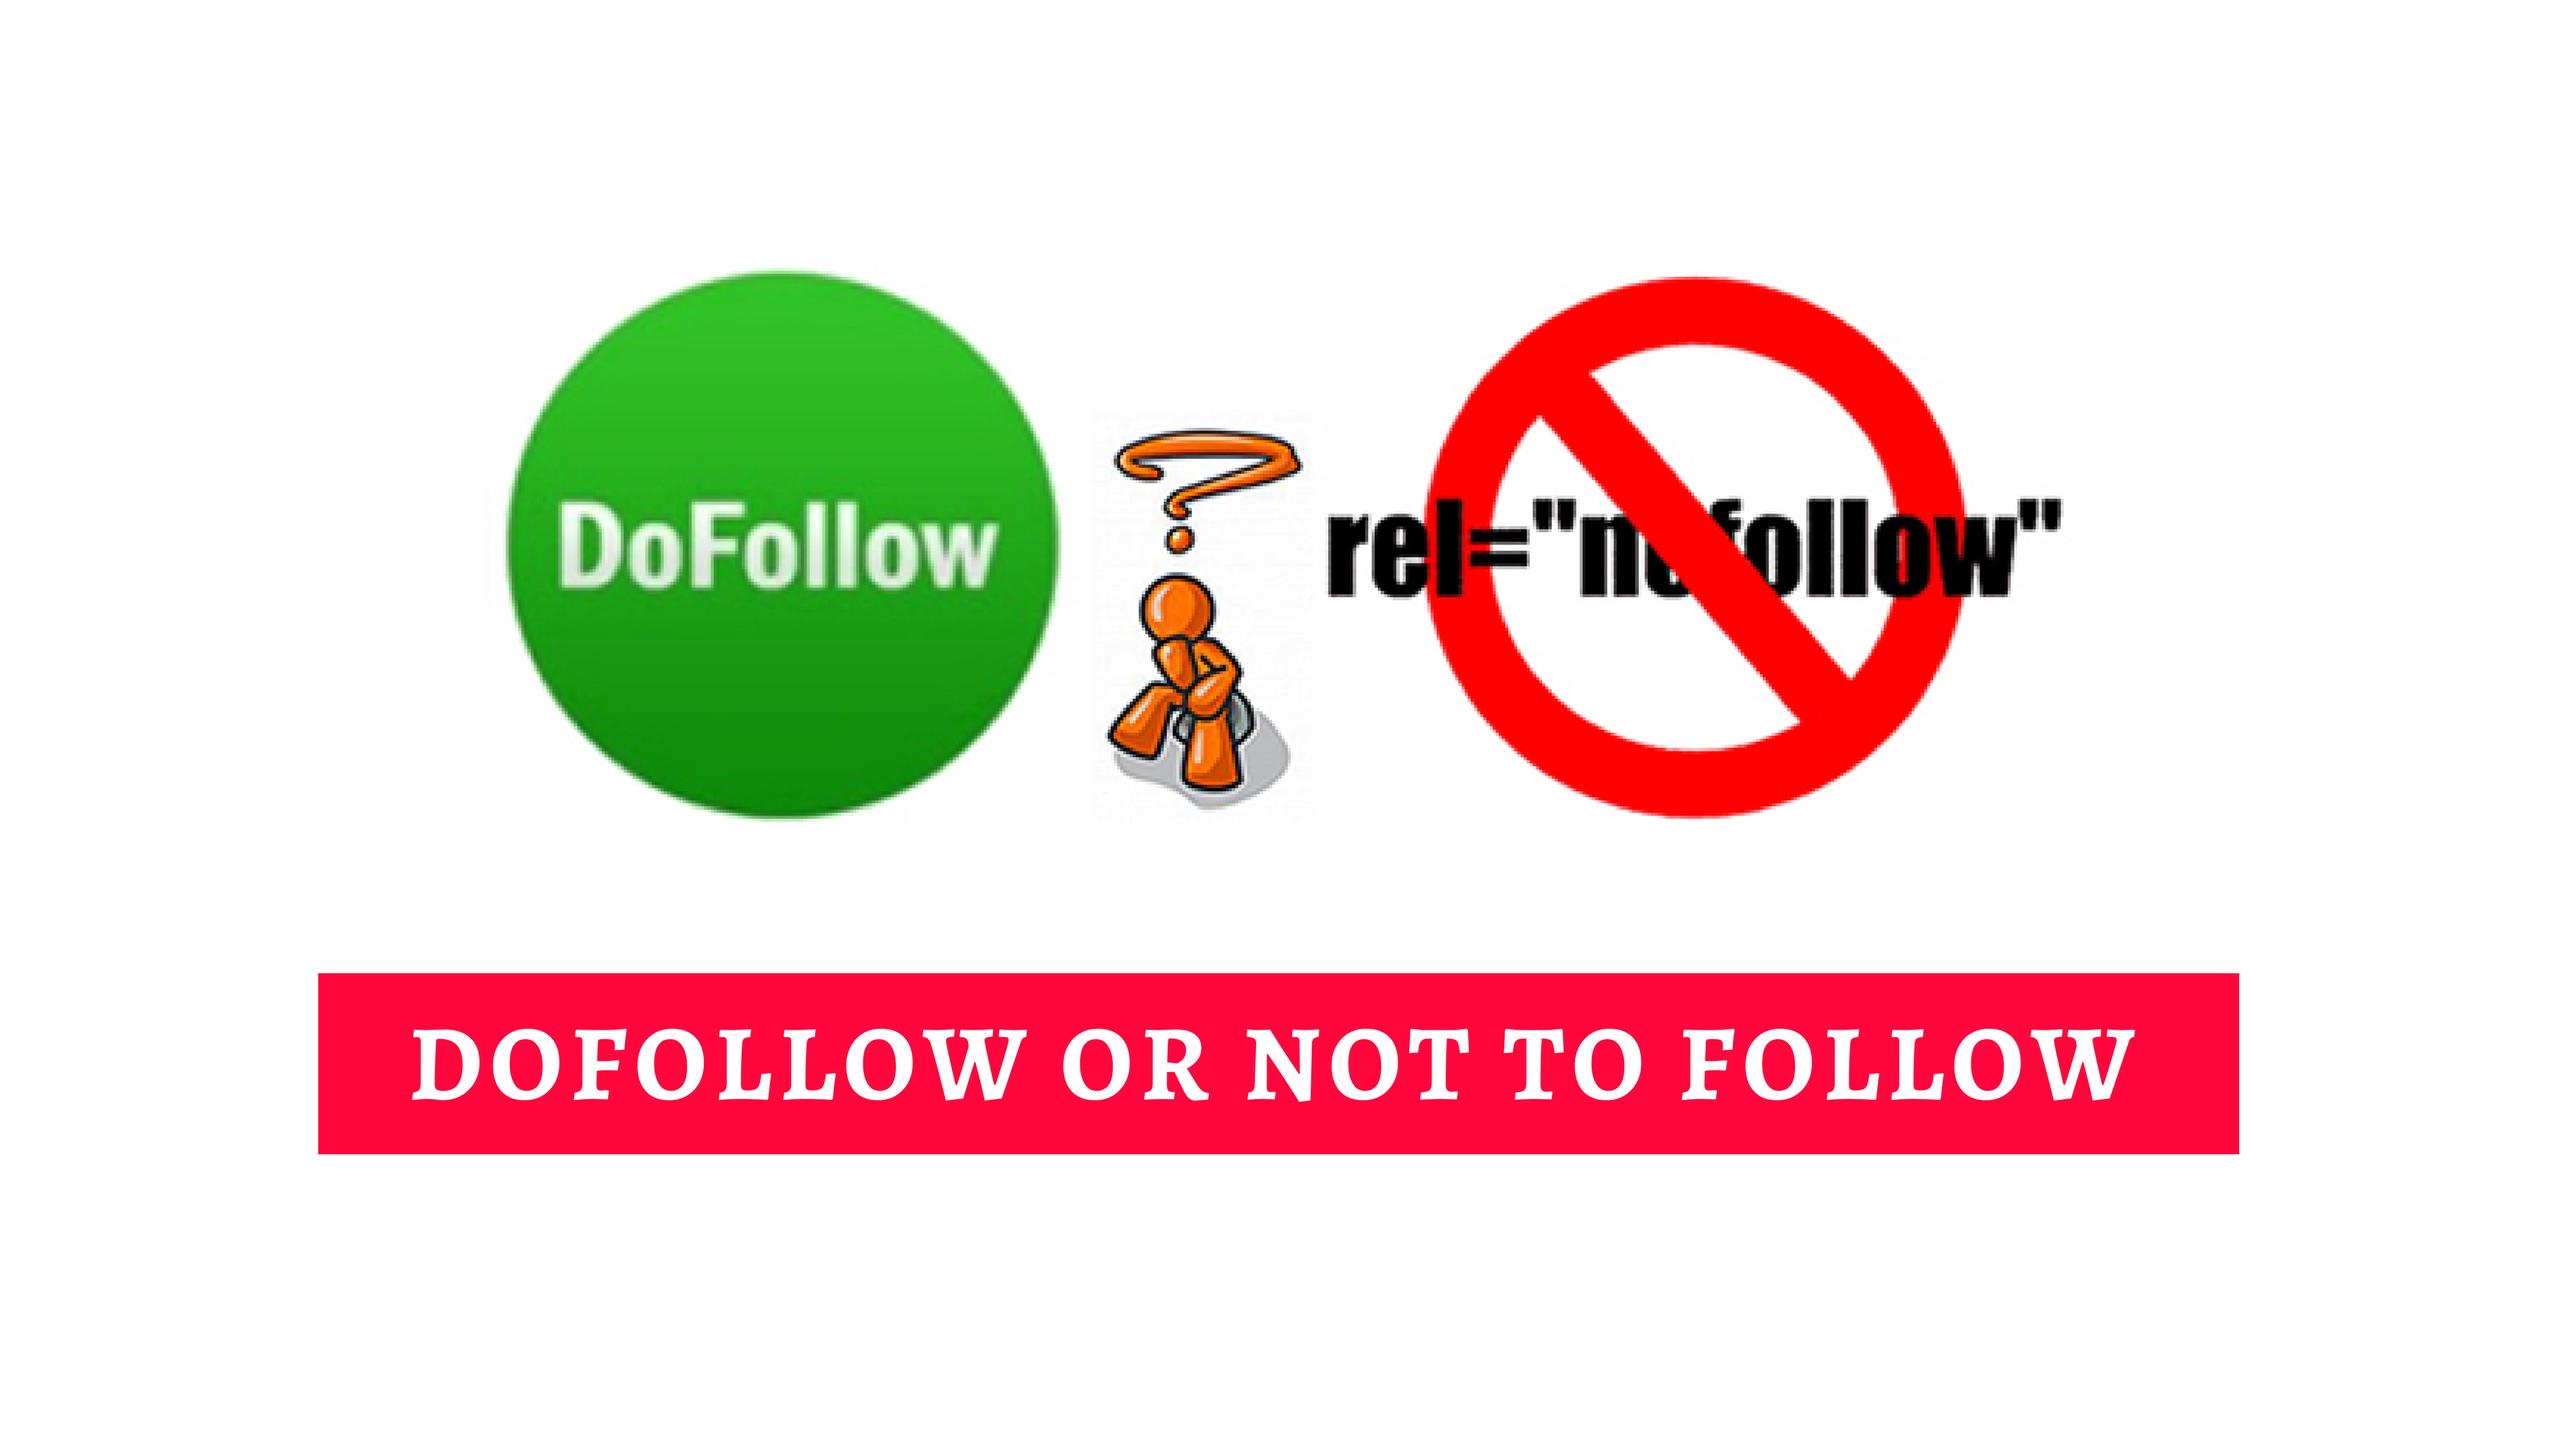 Liên kết Dofollow